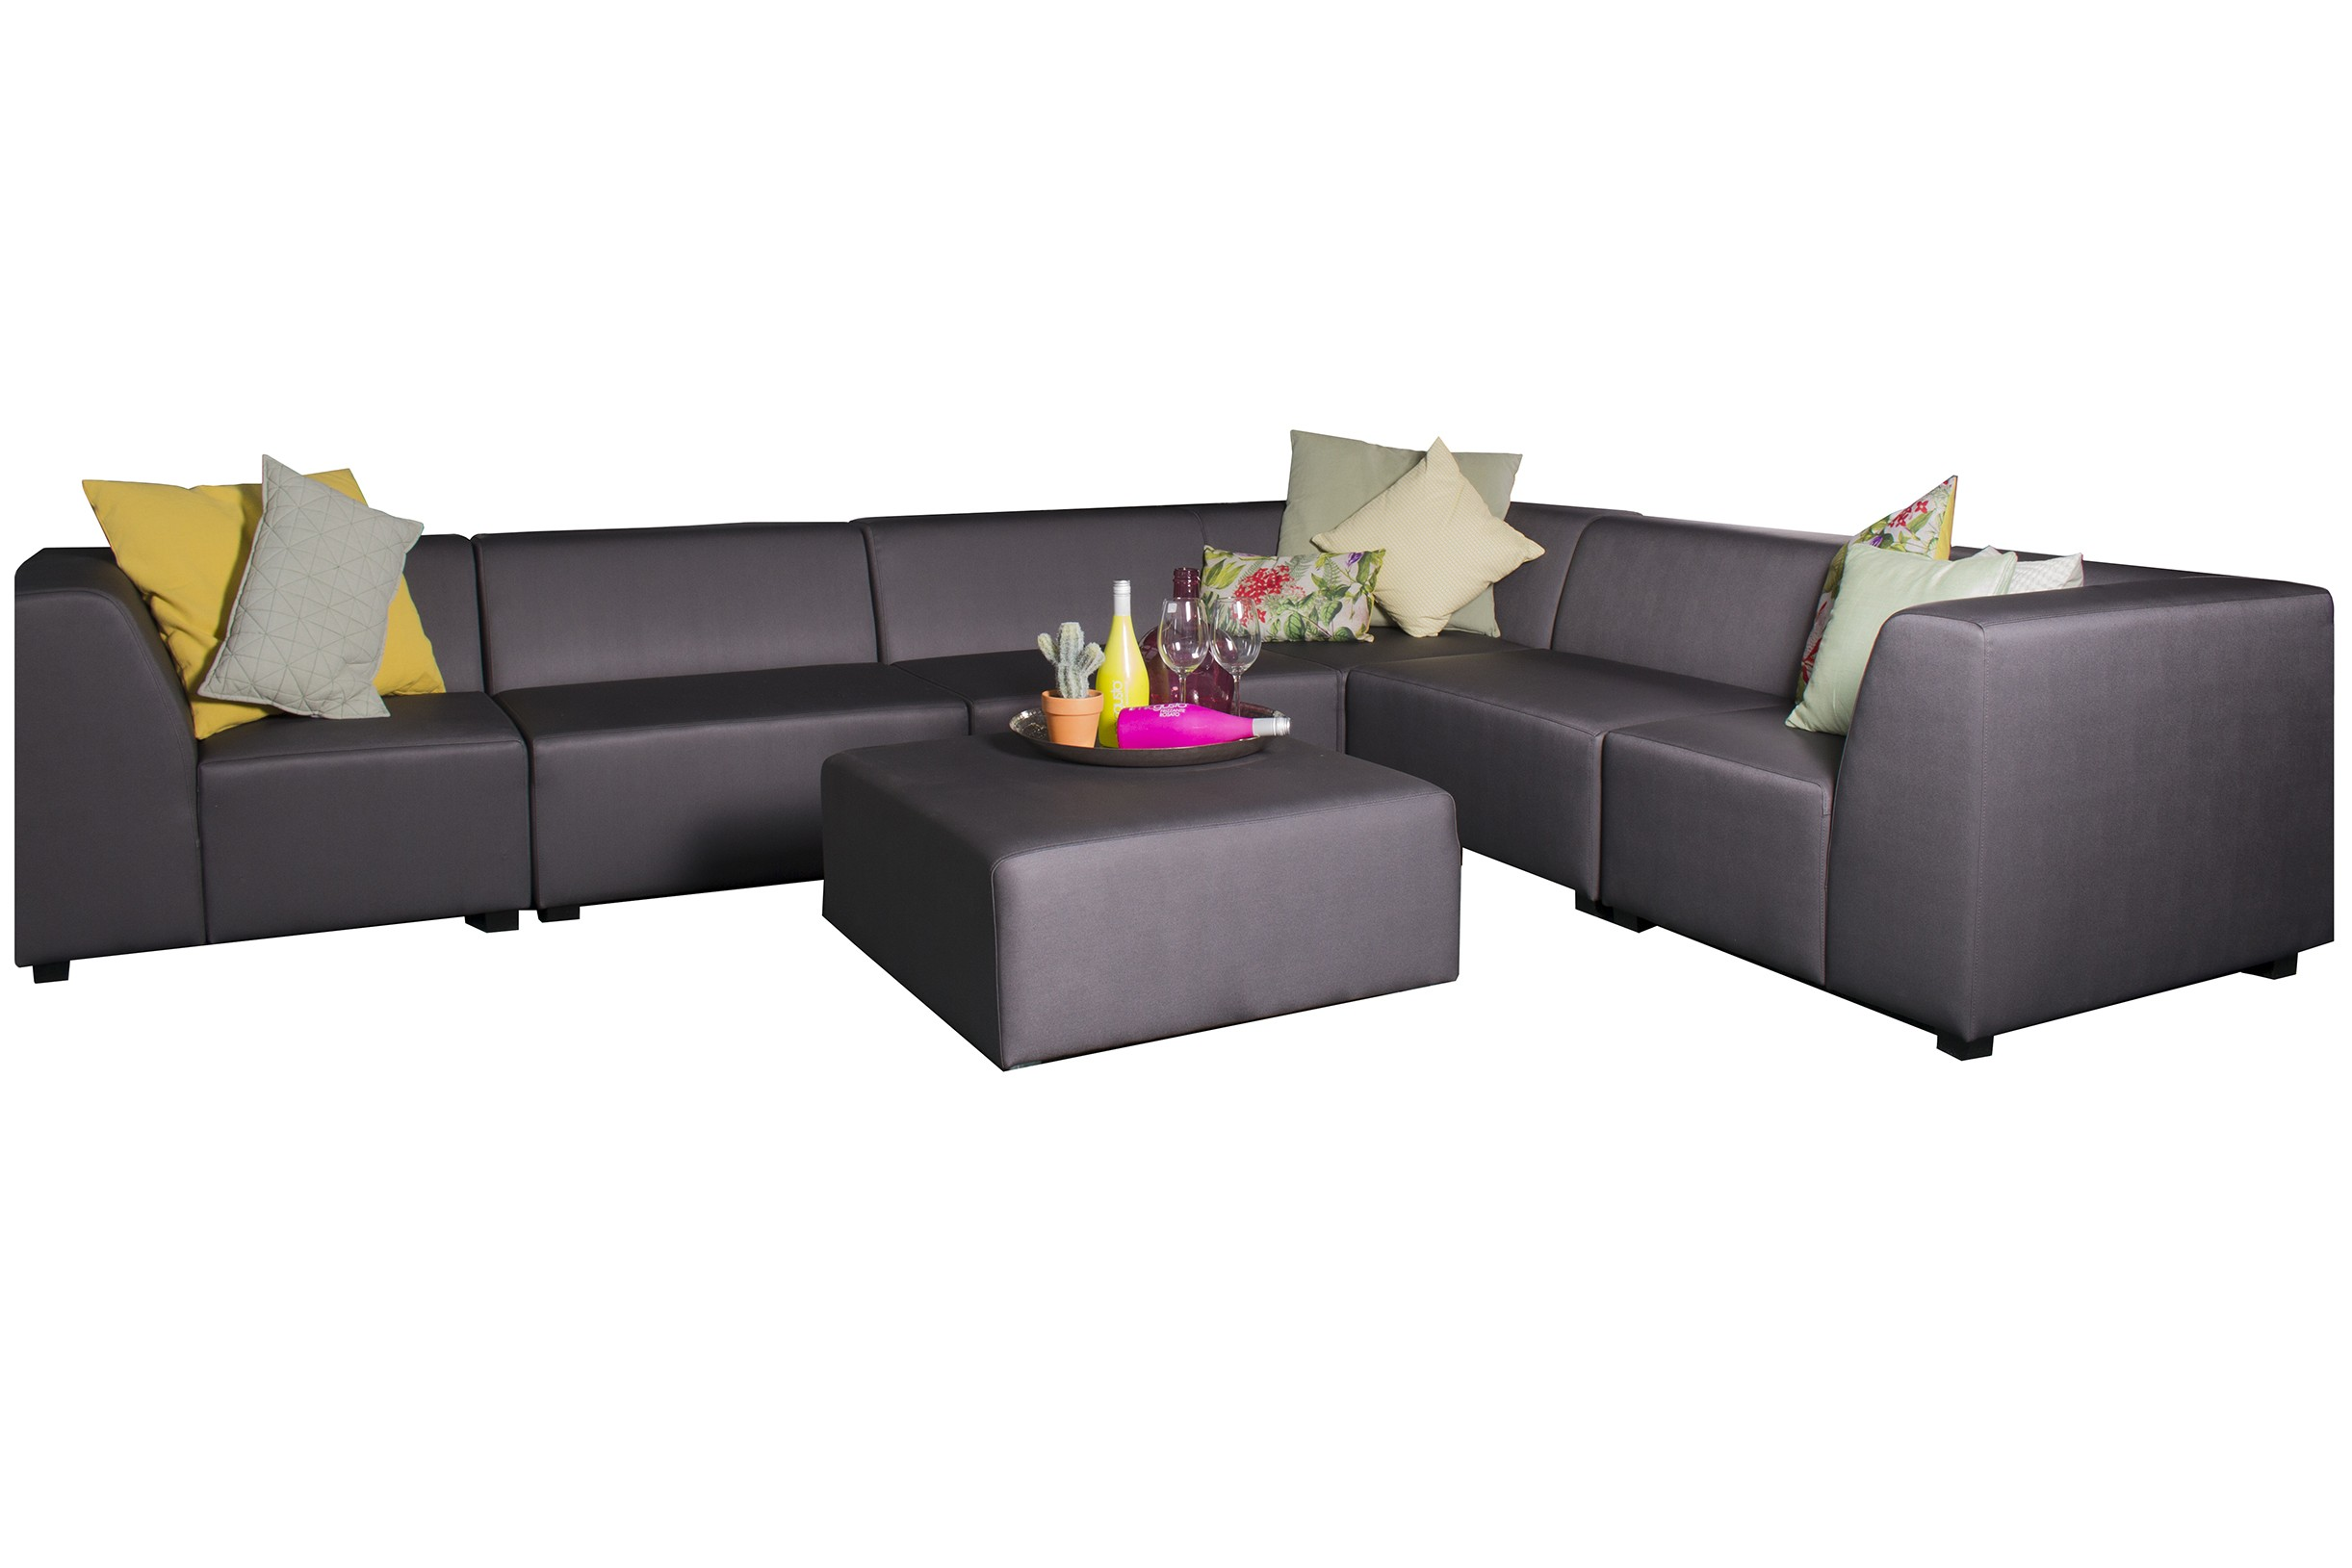 8343 - All-weather lounge elementen Bahama